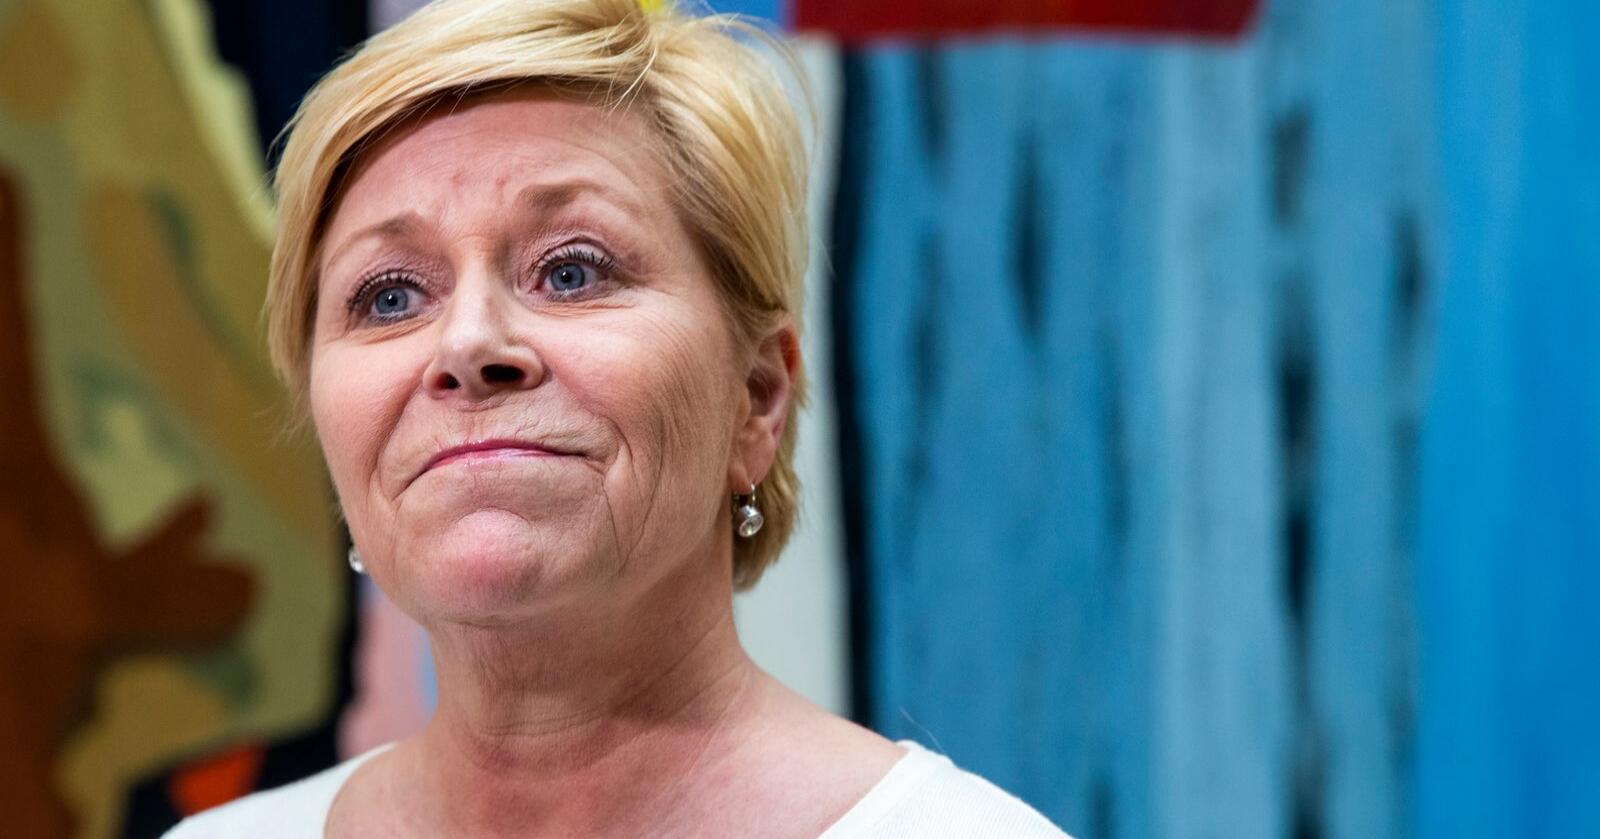 Siv Jensen og Frp faller på Vårt Lands nye partimåling. Foto: Terje Pedersen / NTB scanpix